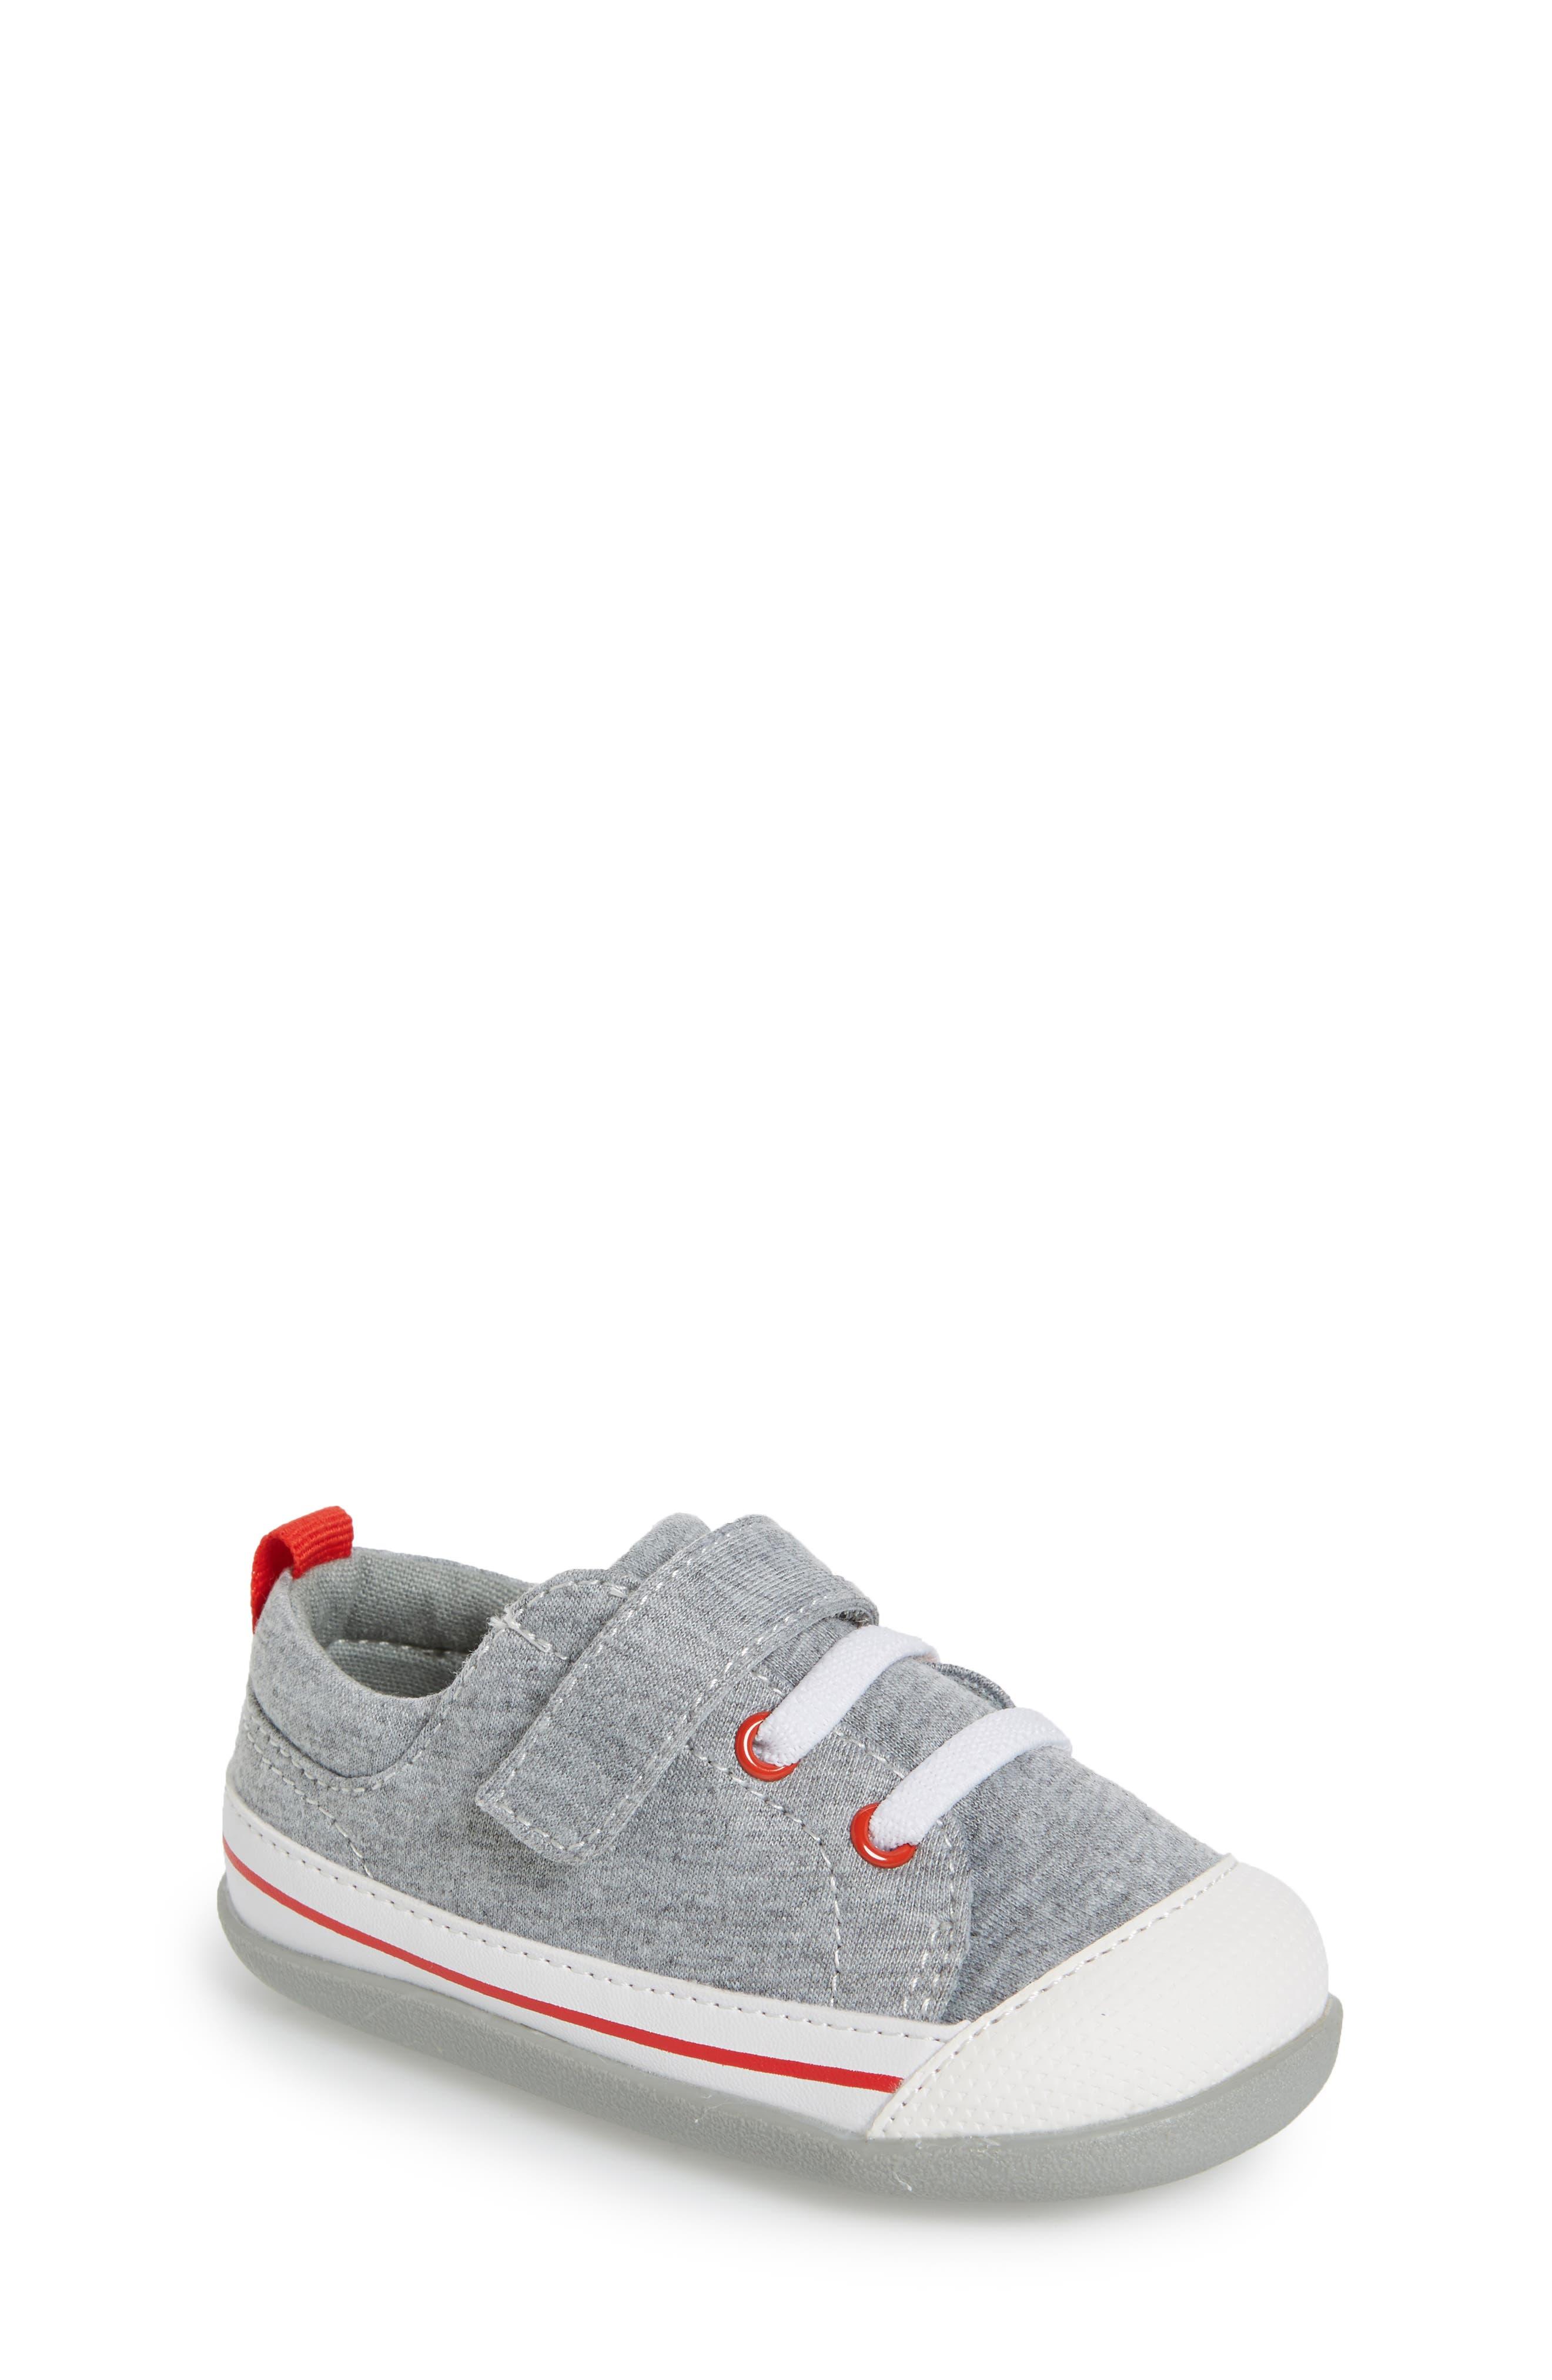 Stevie II Sneaker,                         Main,                         color, GREY JERSEY